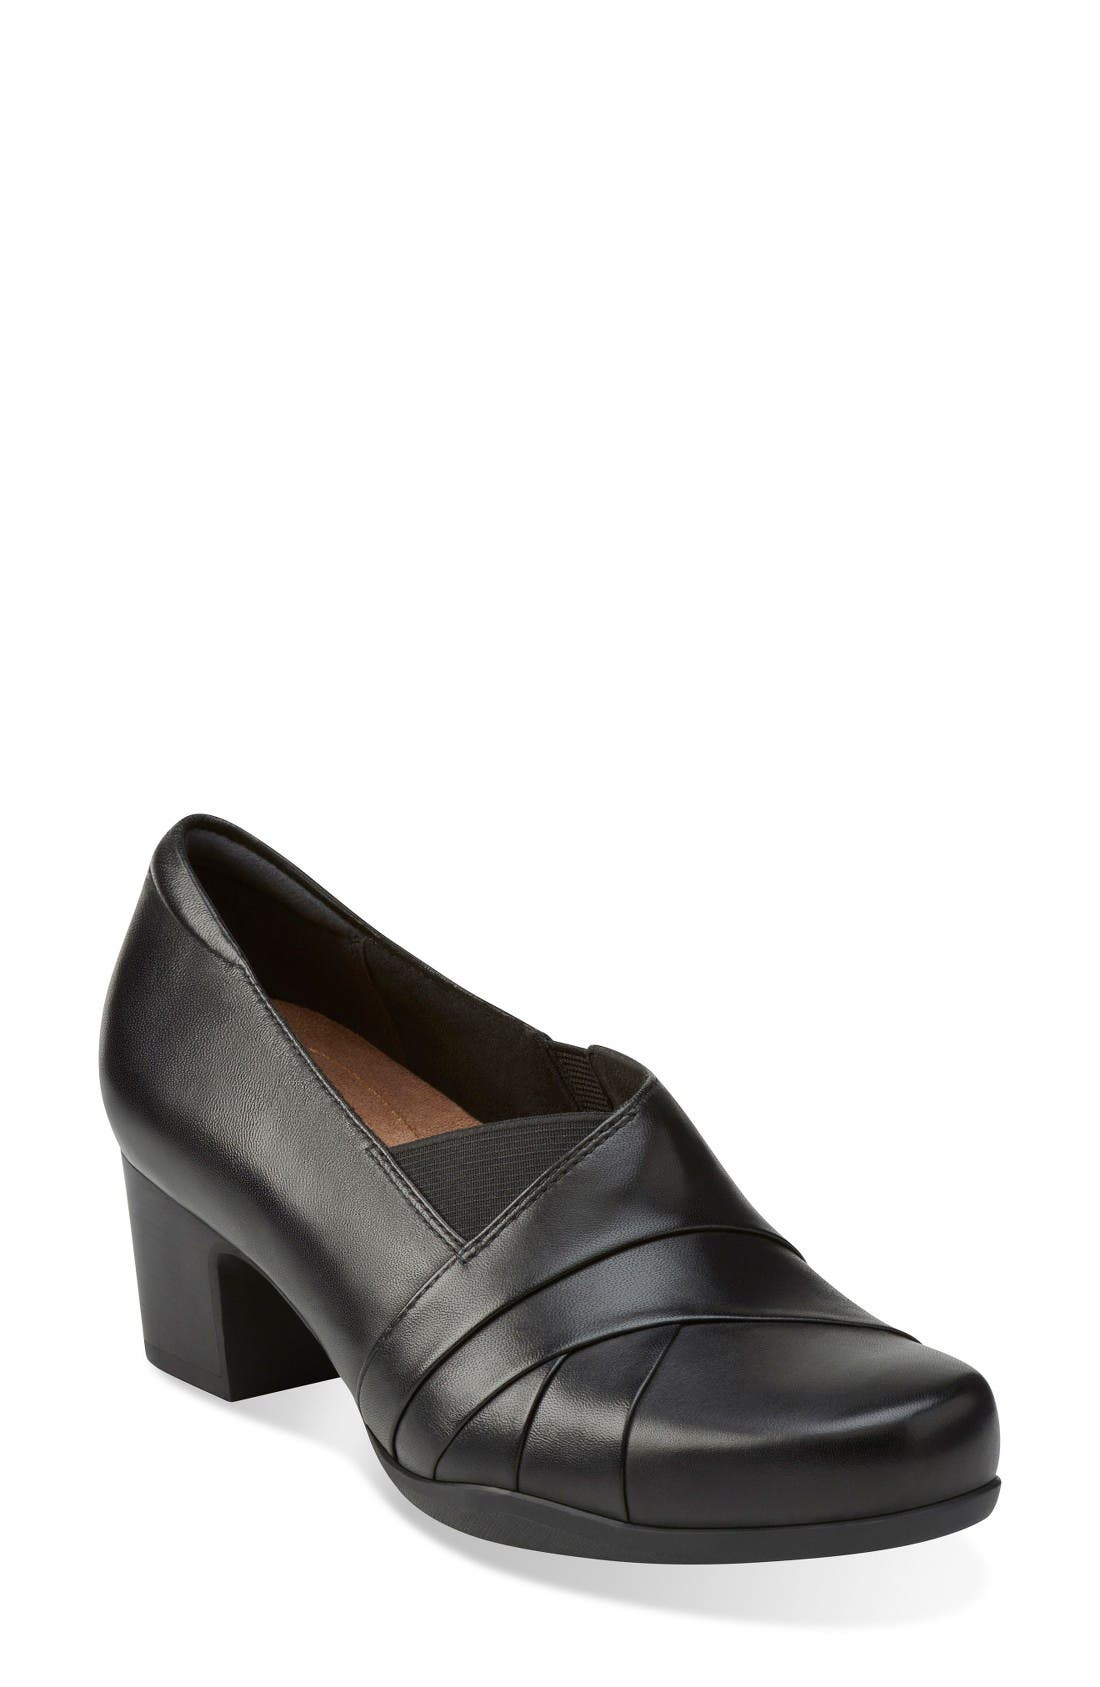 'Rosalyn Adele' Block Heel Pump,                         Main,                         color, Black Leather